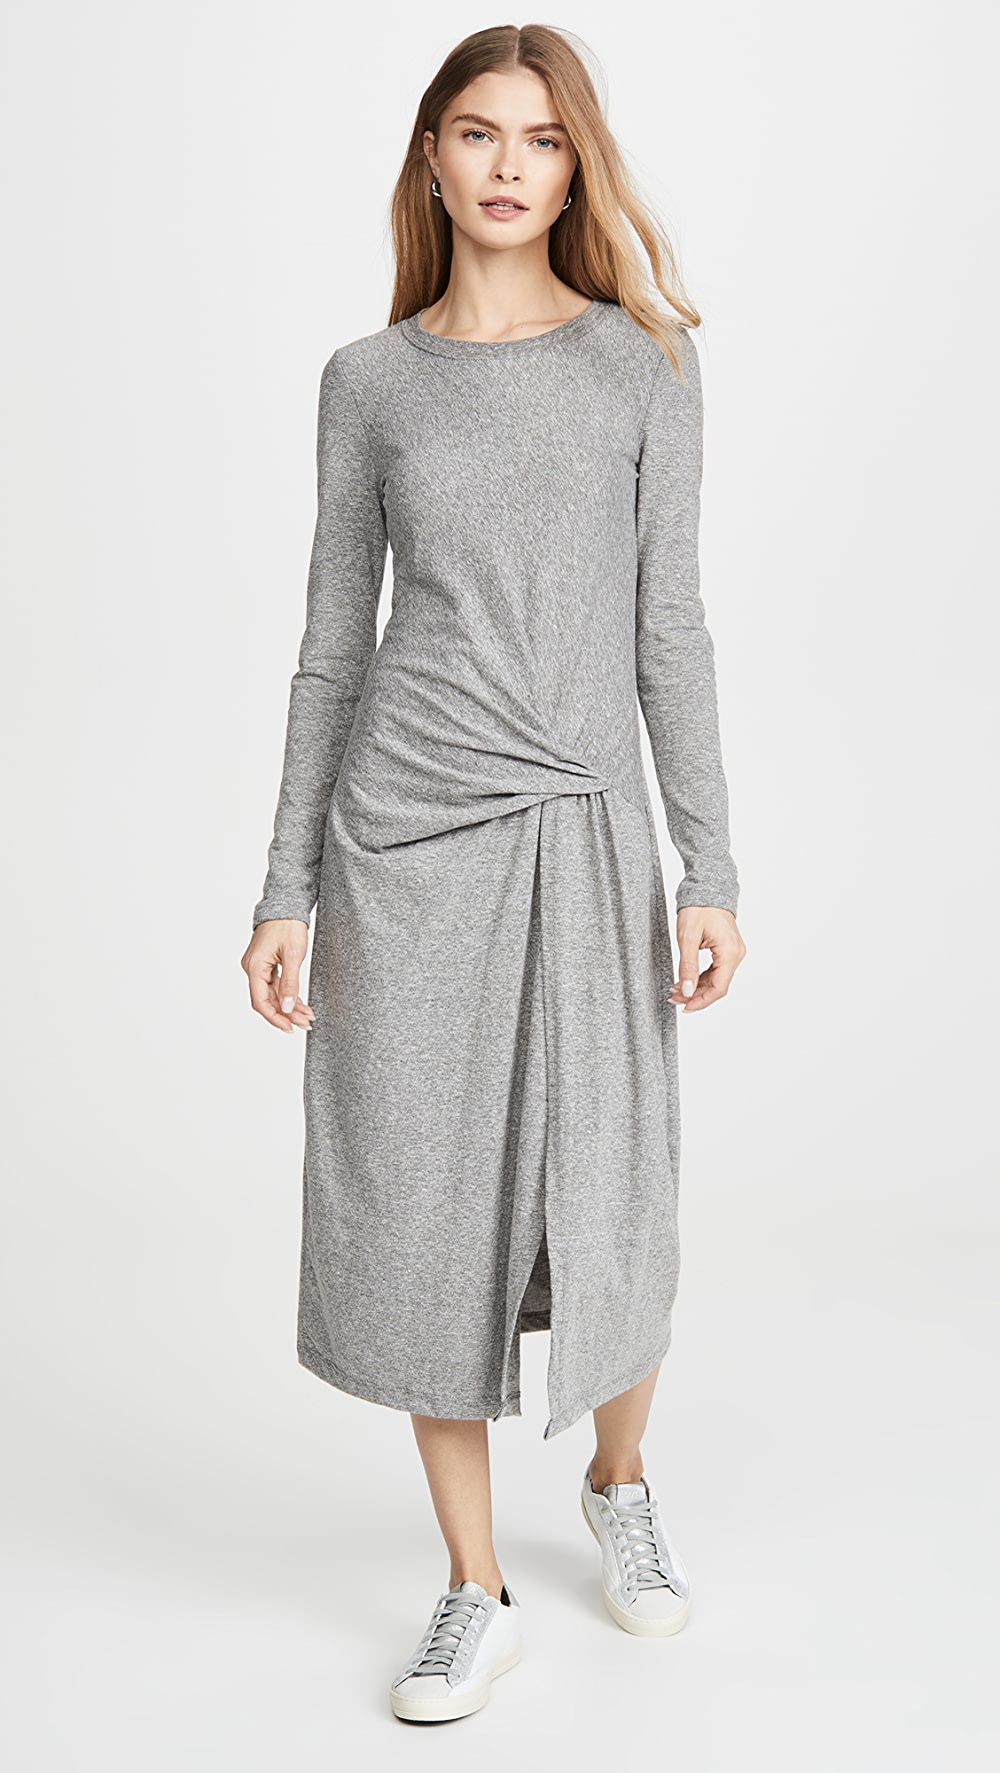 100% Quality Current/elliott - The Vega Dress The Latest Fashion